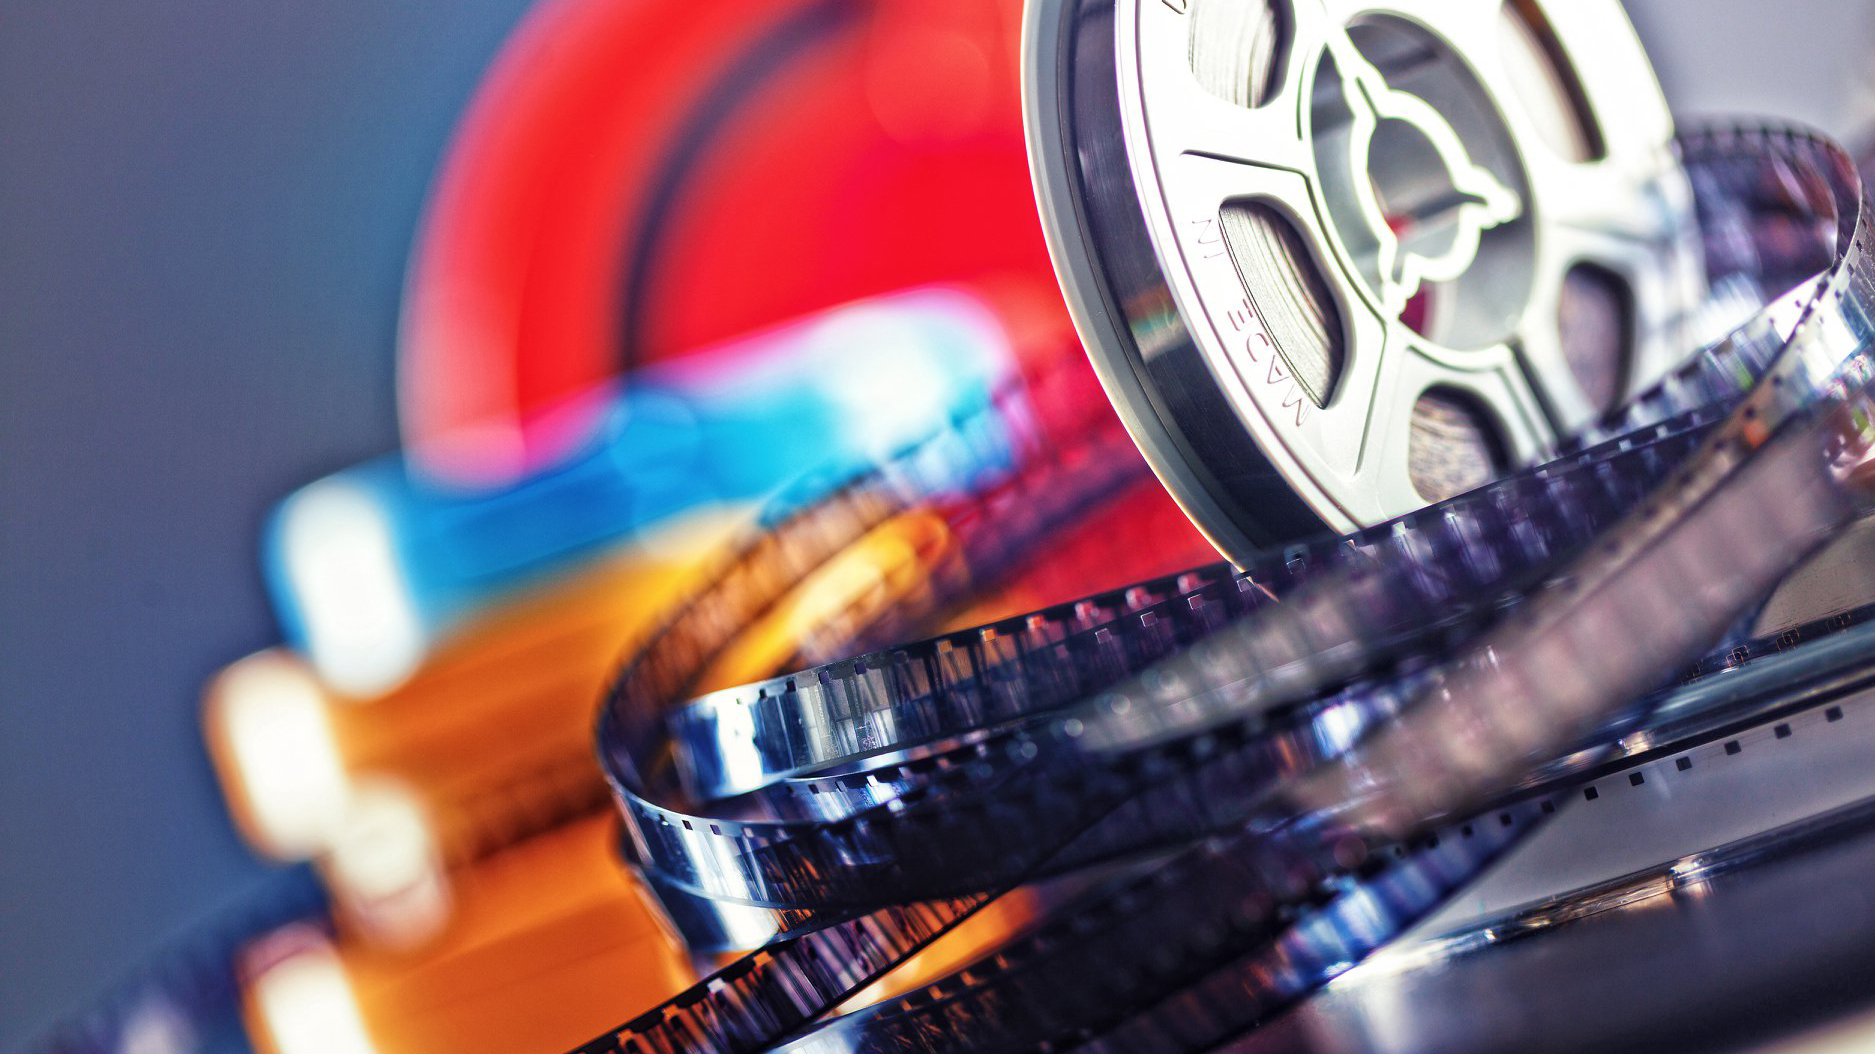 Digitize movie film